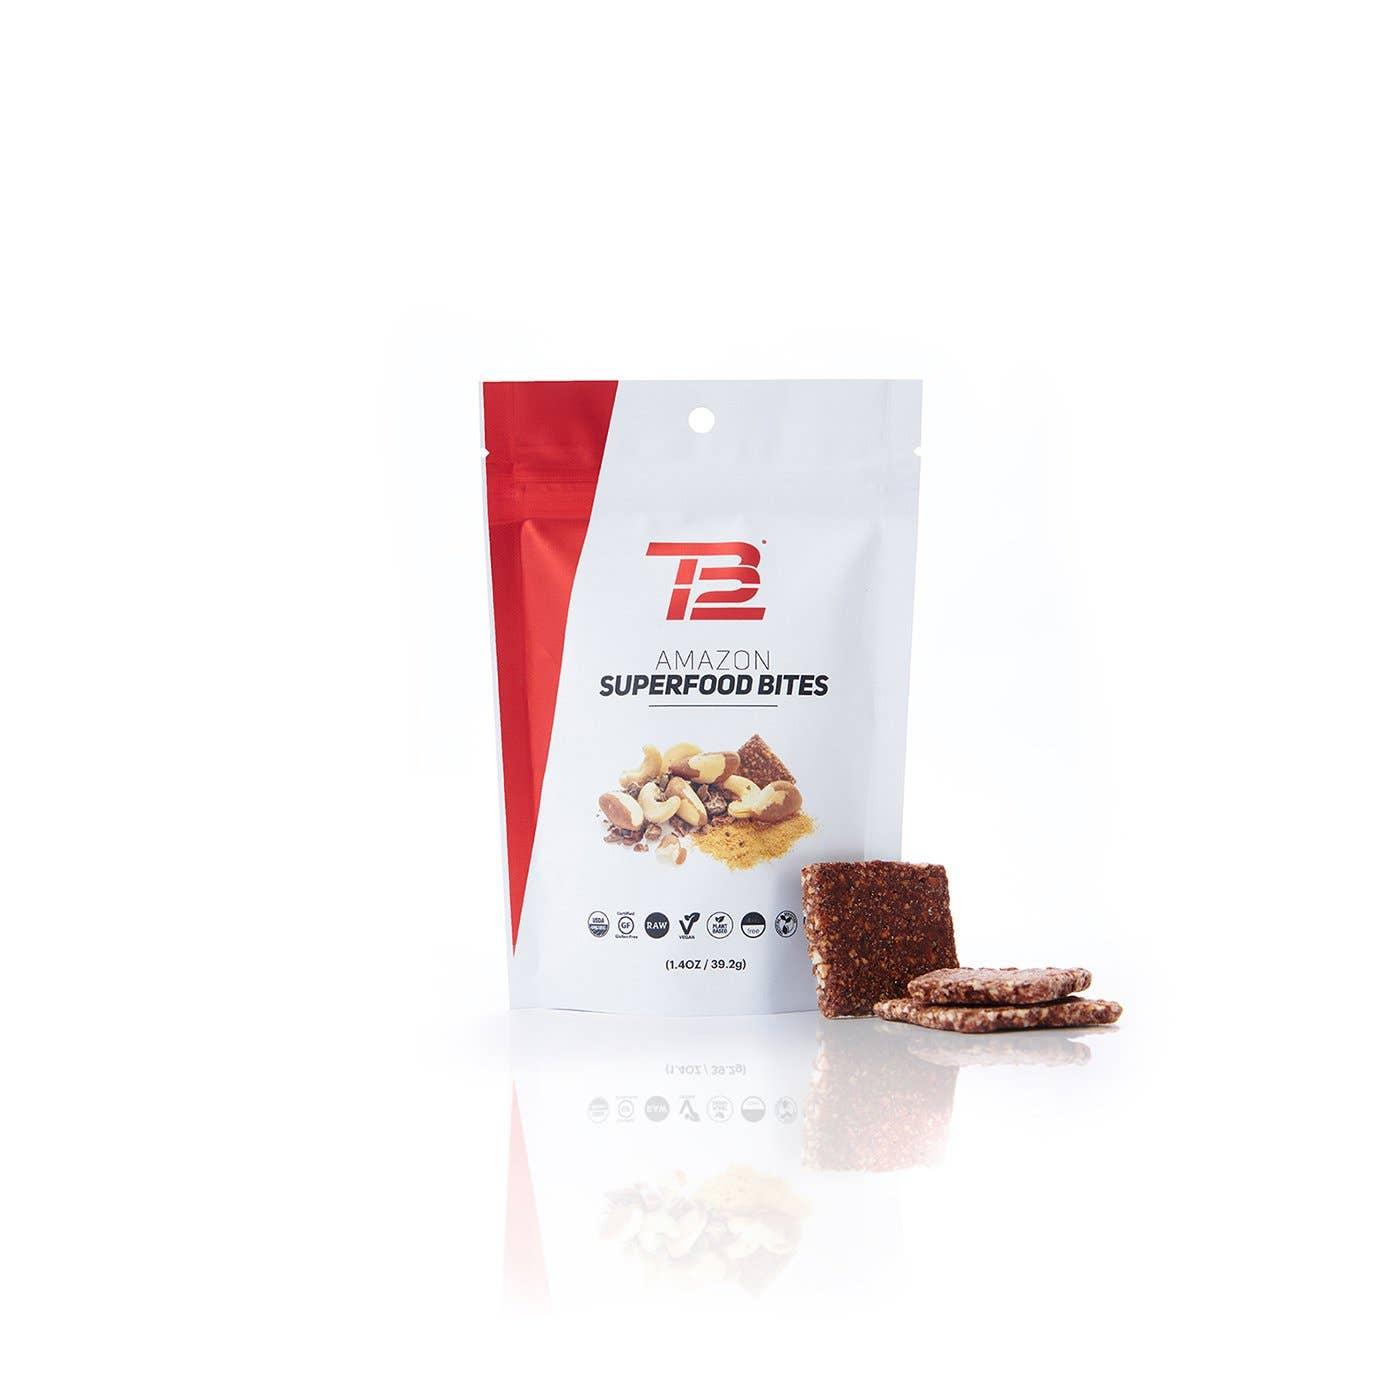 TB12™ Amazon Superfood Bites